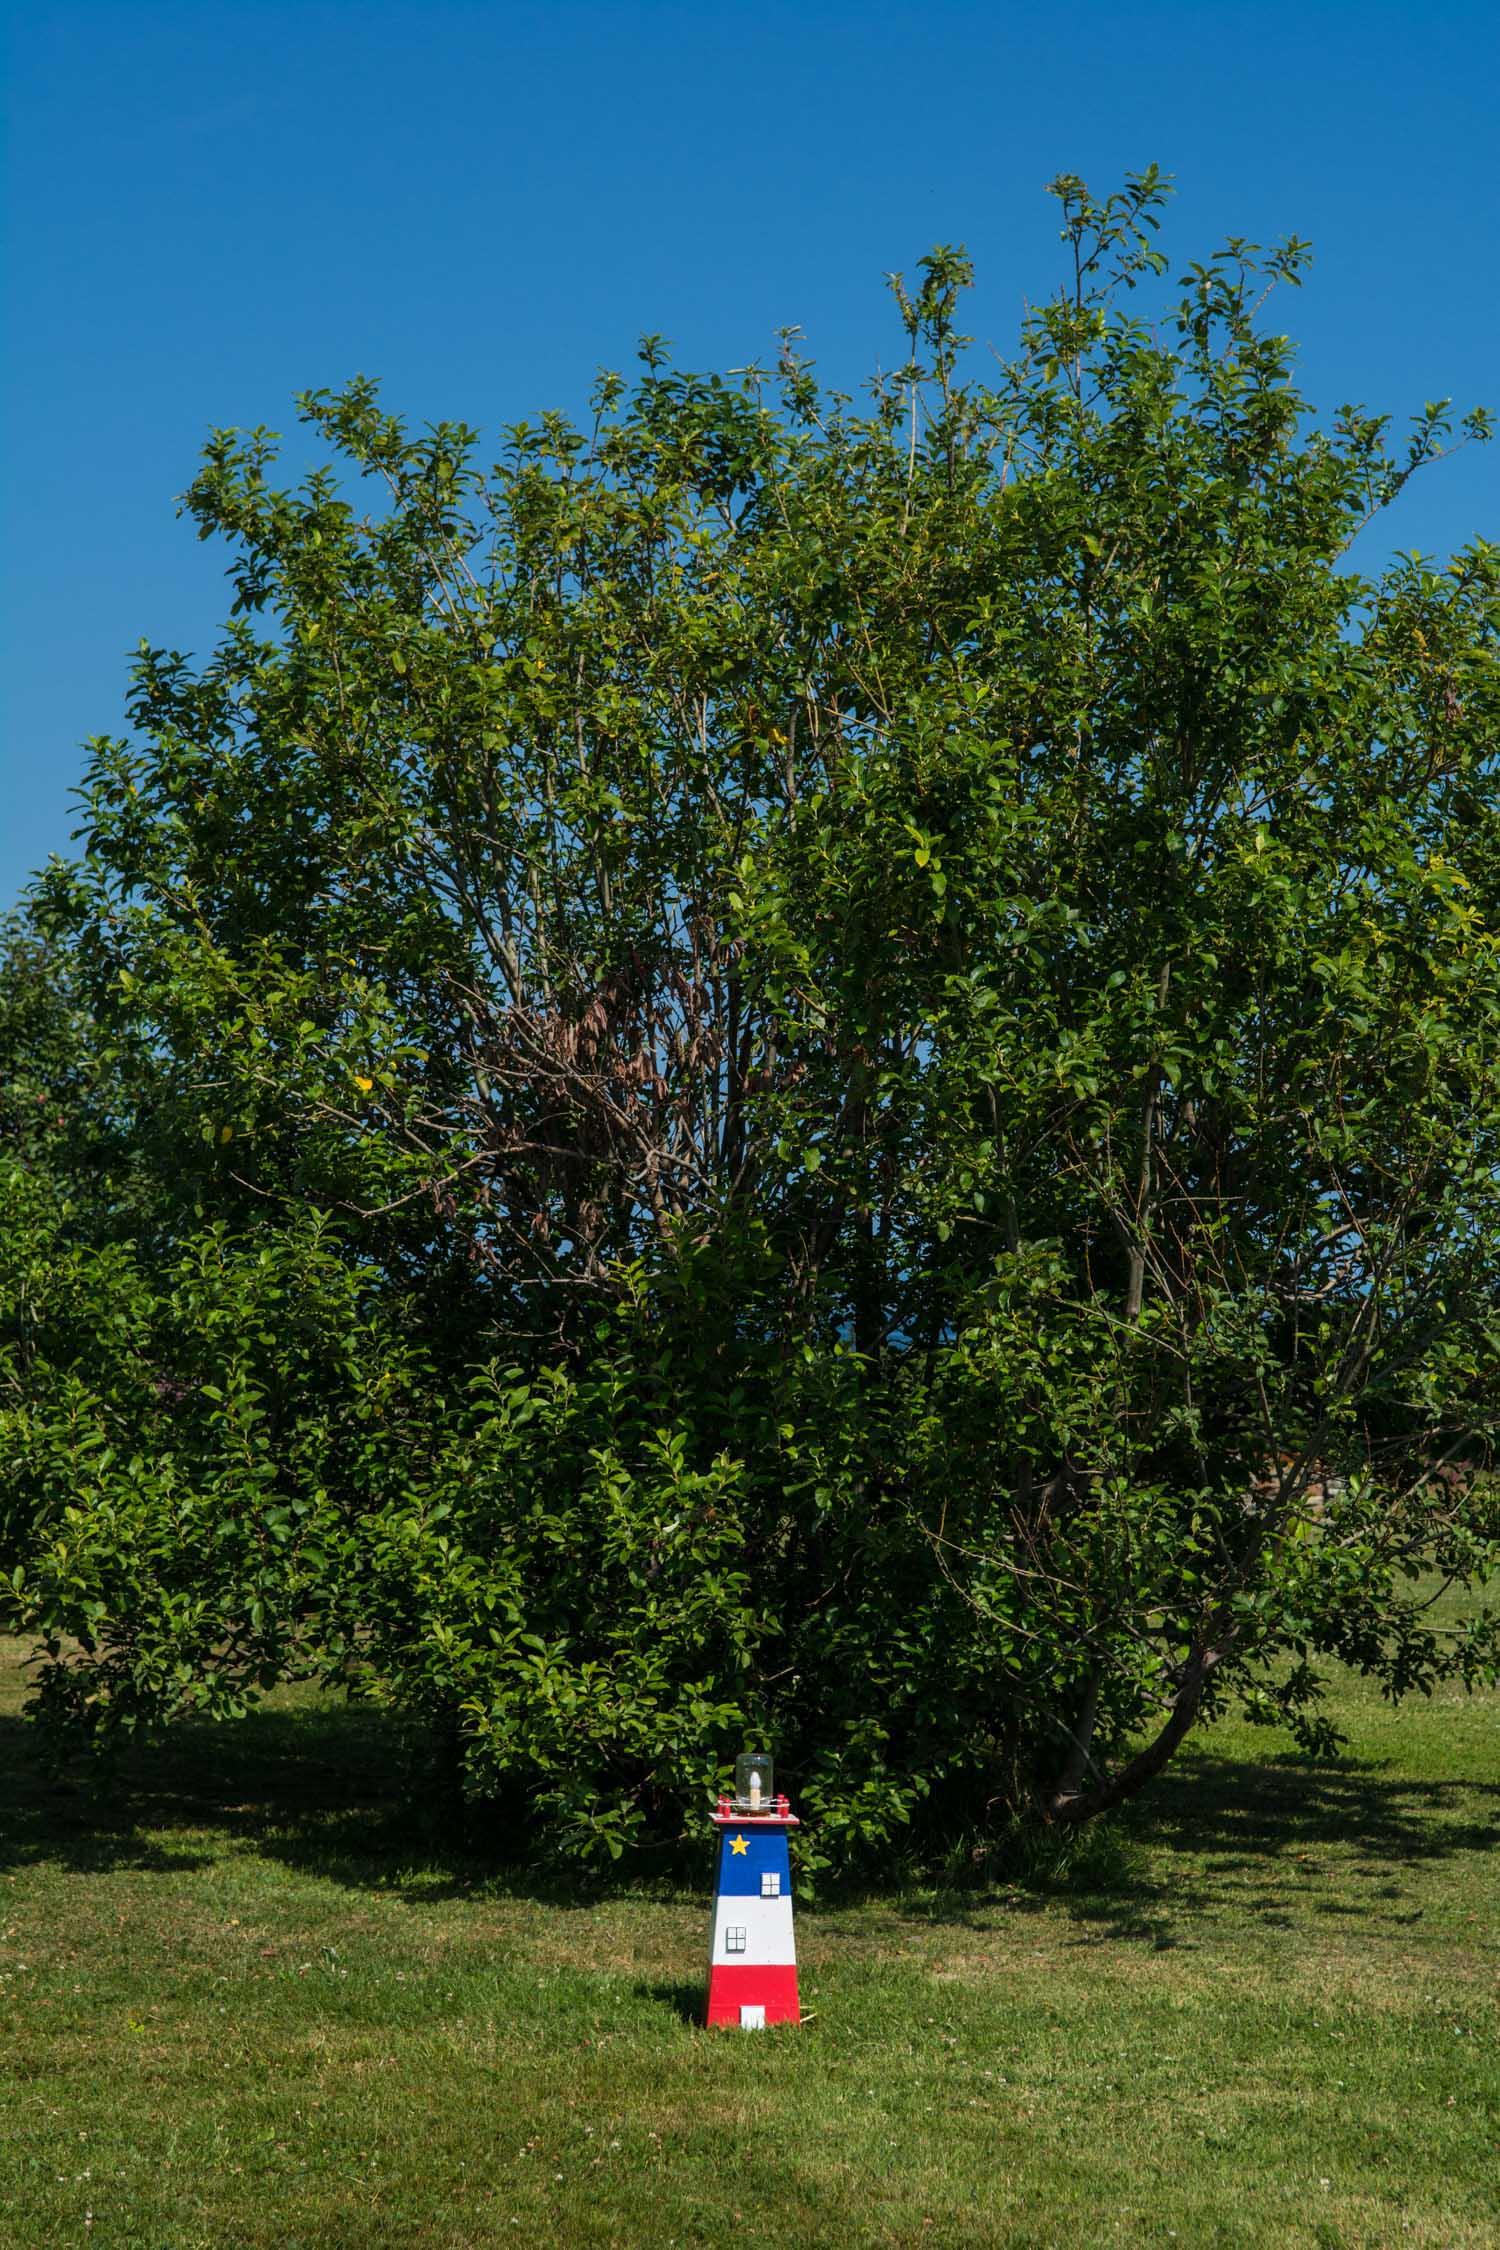 aug10-15 2014-Tourism New Brunswick-T4G Kick-summer 2014-Miramichi-Bathurst-Caraquet-Shippagan-Miscou Island-NB-web res jpg-photo by Aaron McKenzie Fraser-www.amfraser.com_AMF2473.jpg